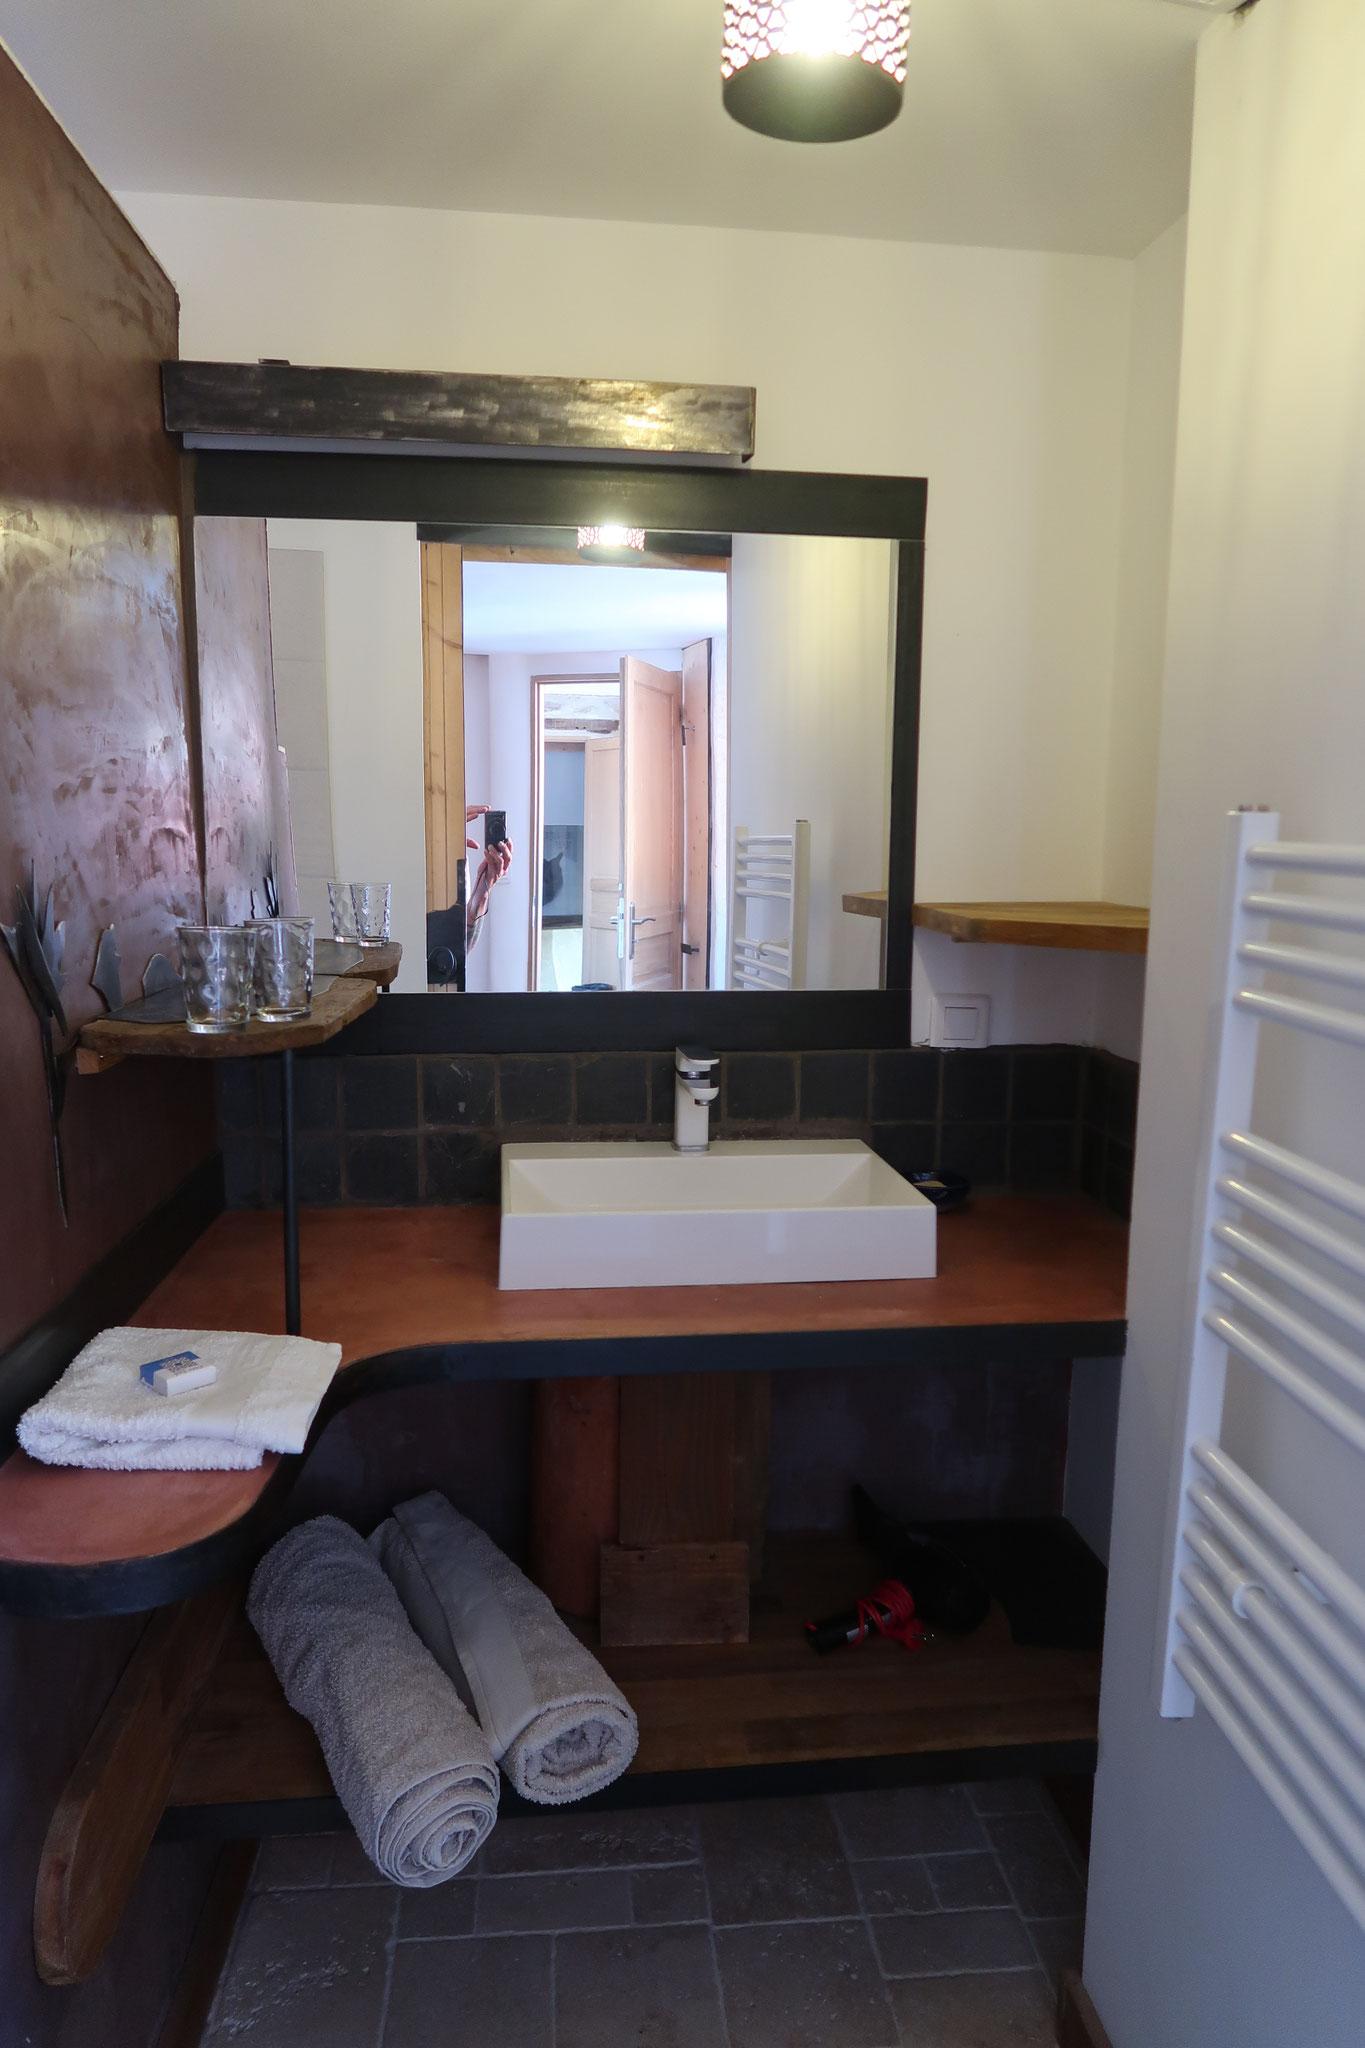 sdb basquiat room